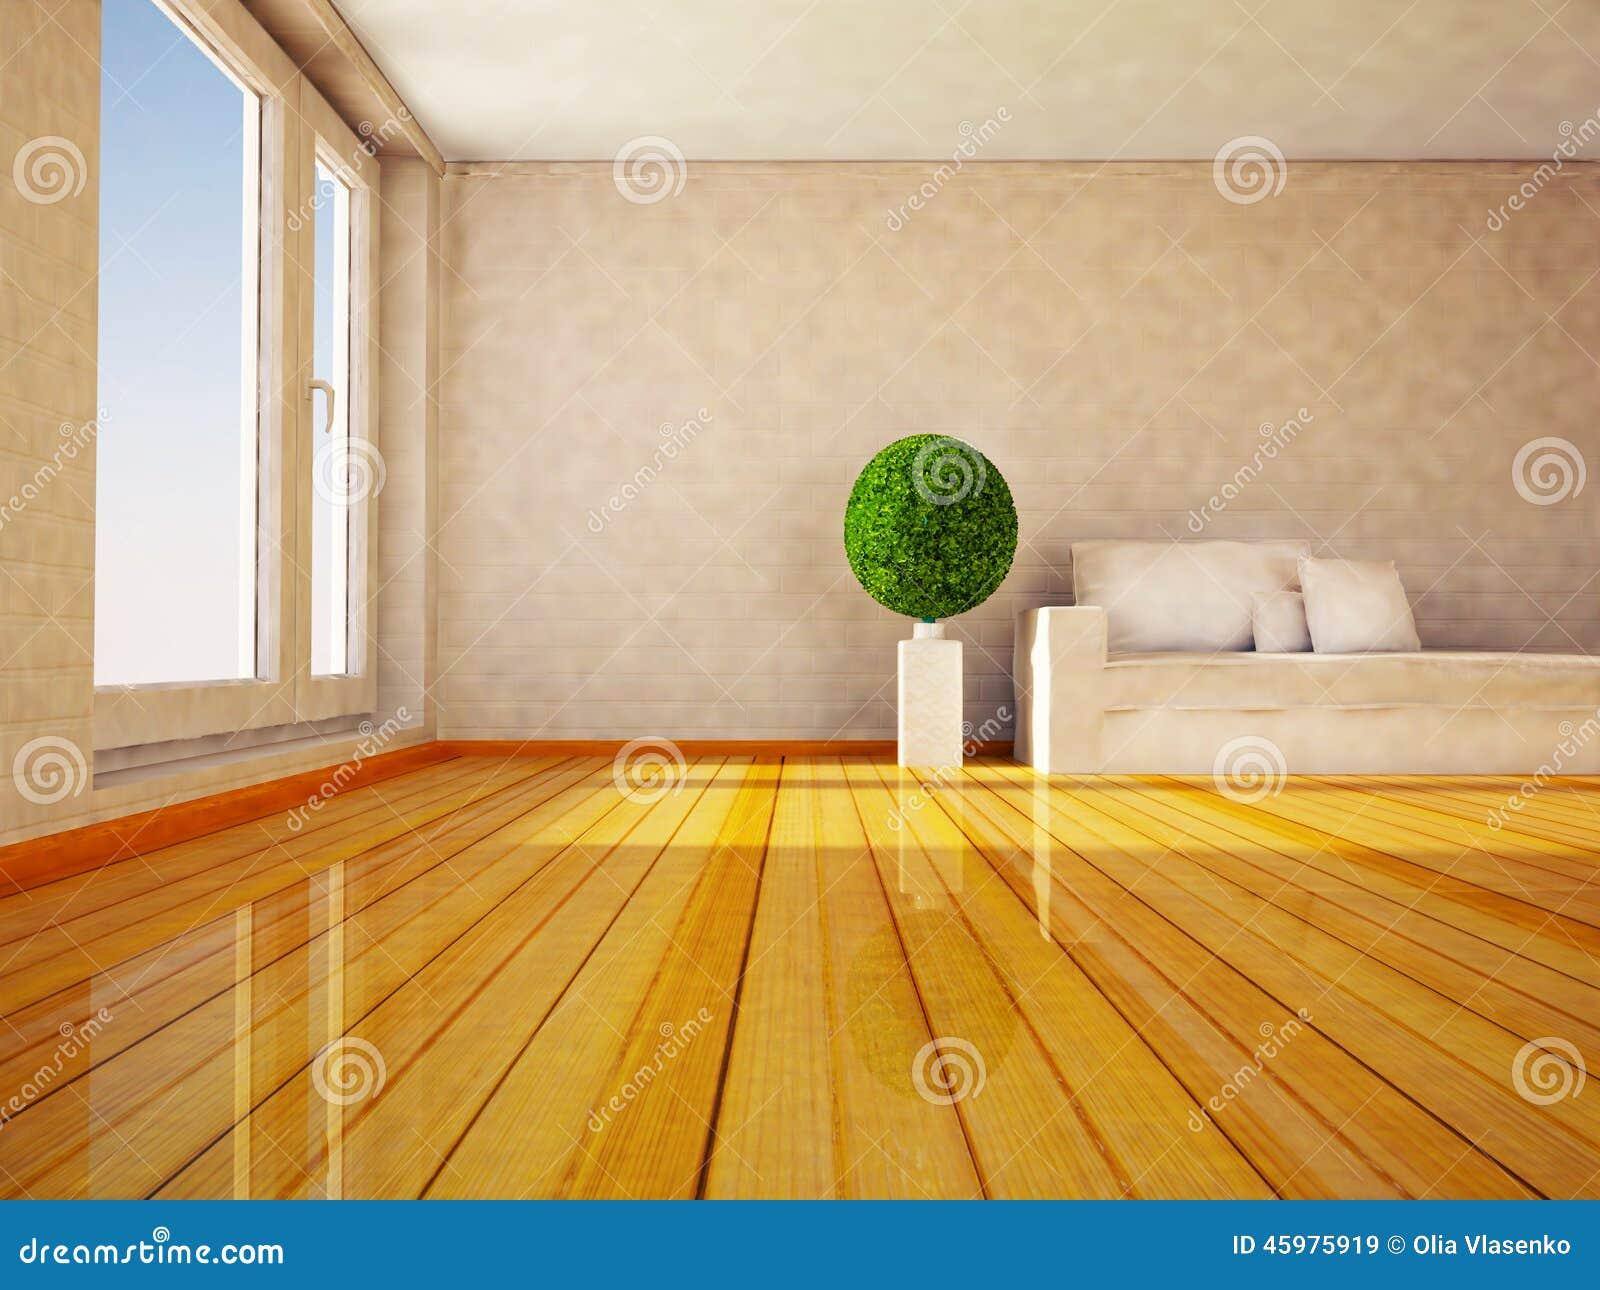 Plante verte ronde dans la chambre illustration stock image 45975919 - Plante dans la chambre ...